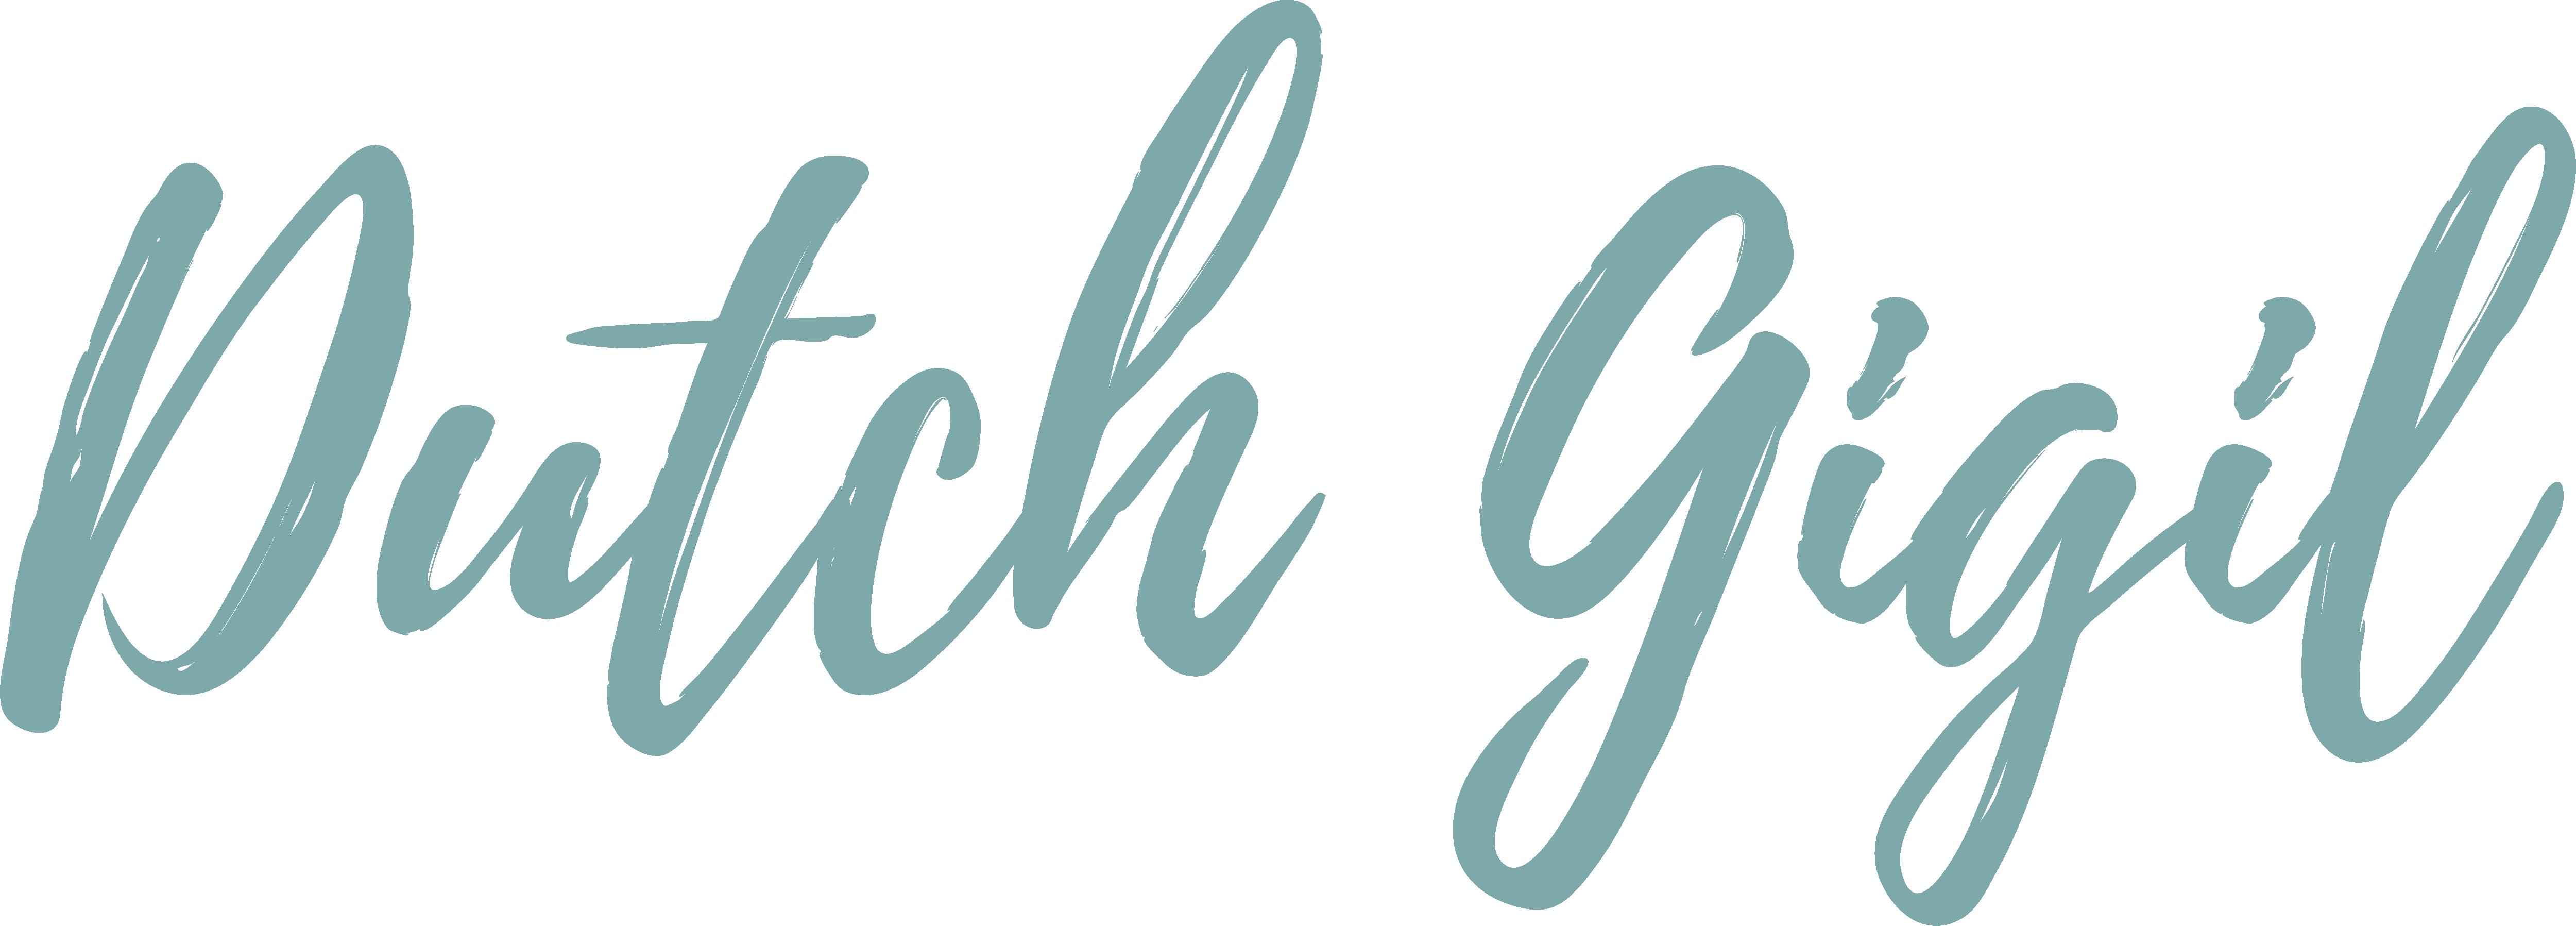 Ducth Gigil tekst